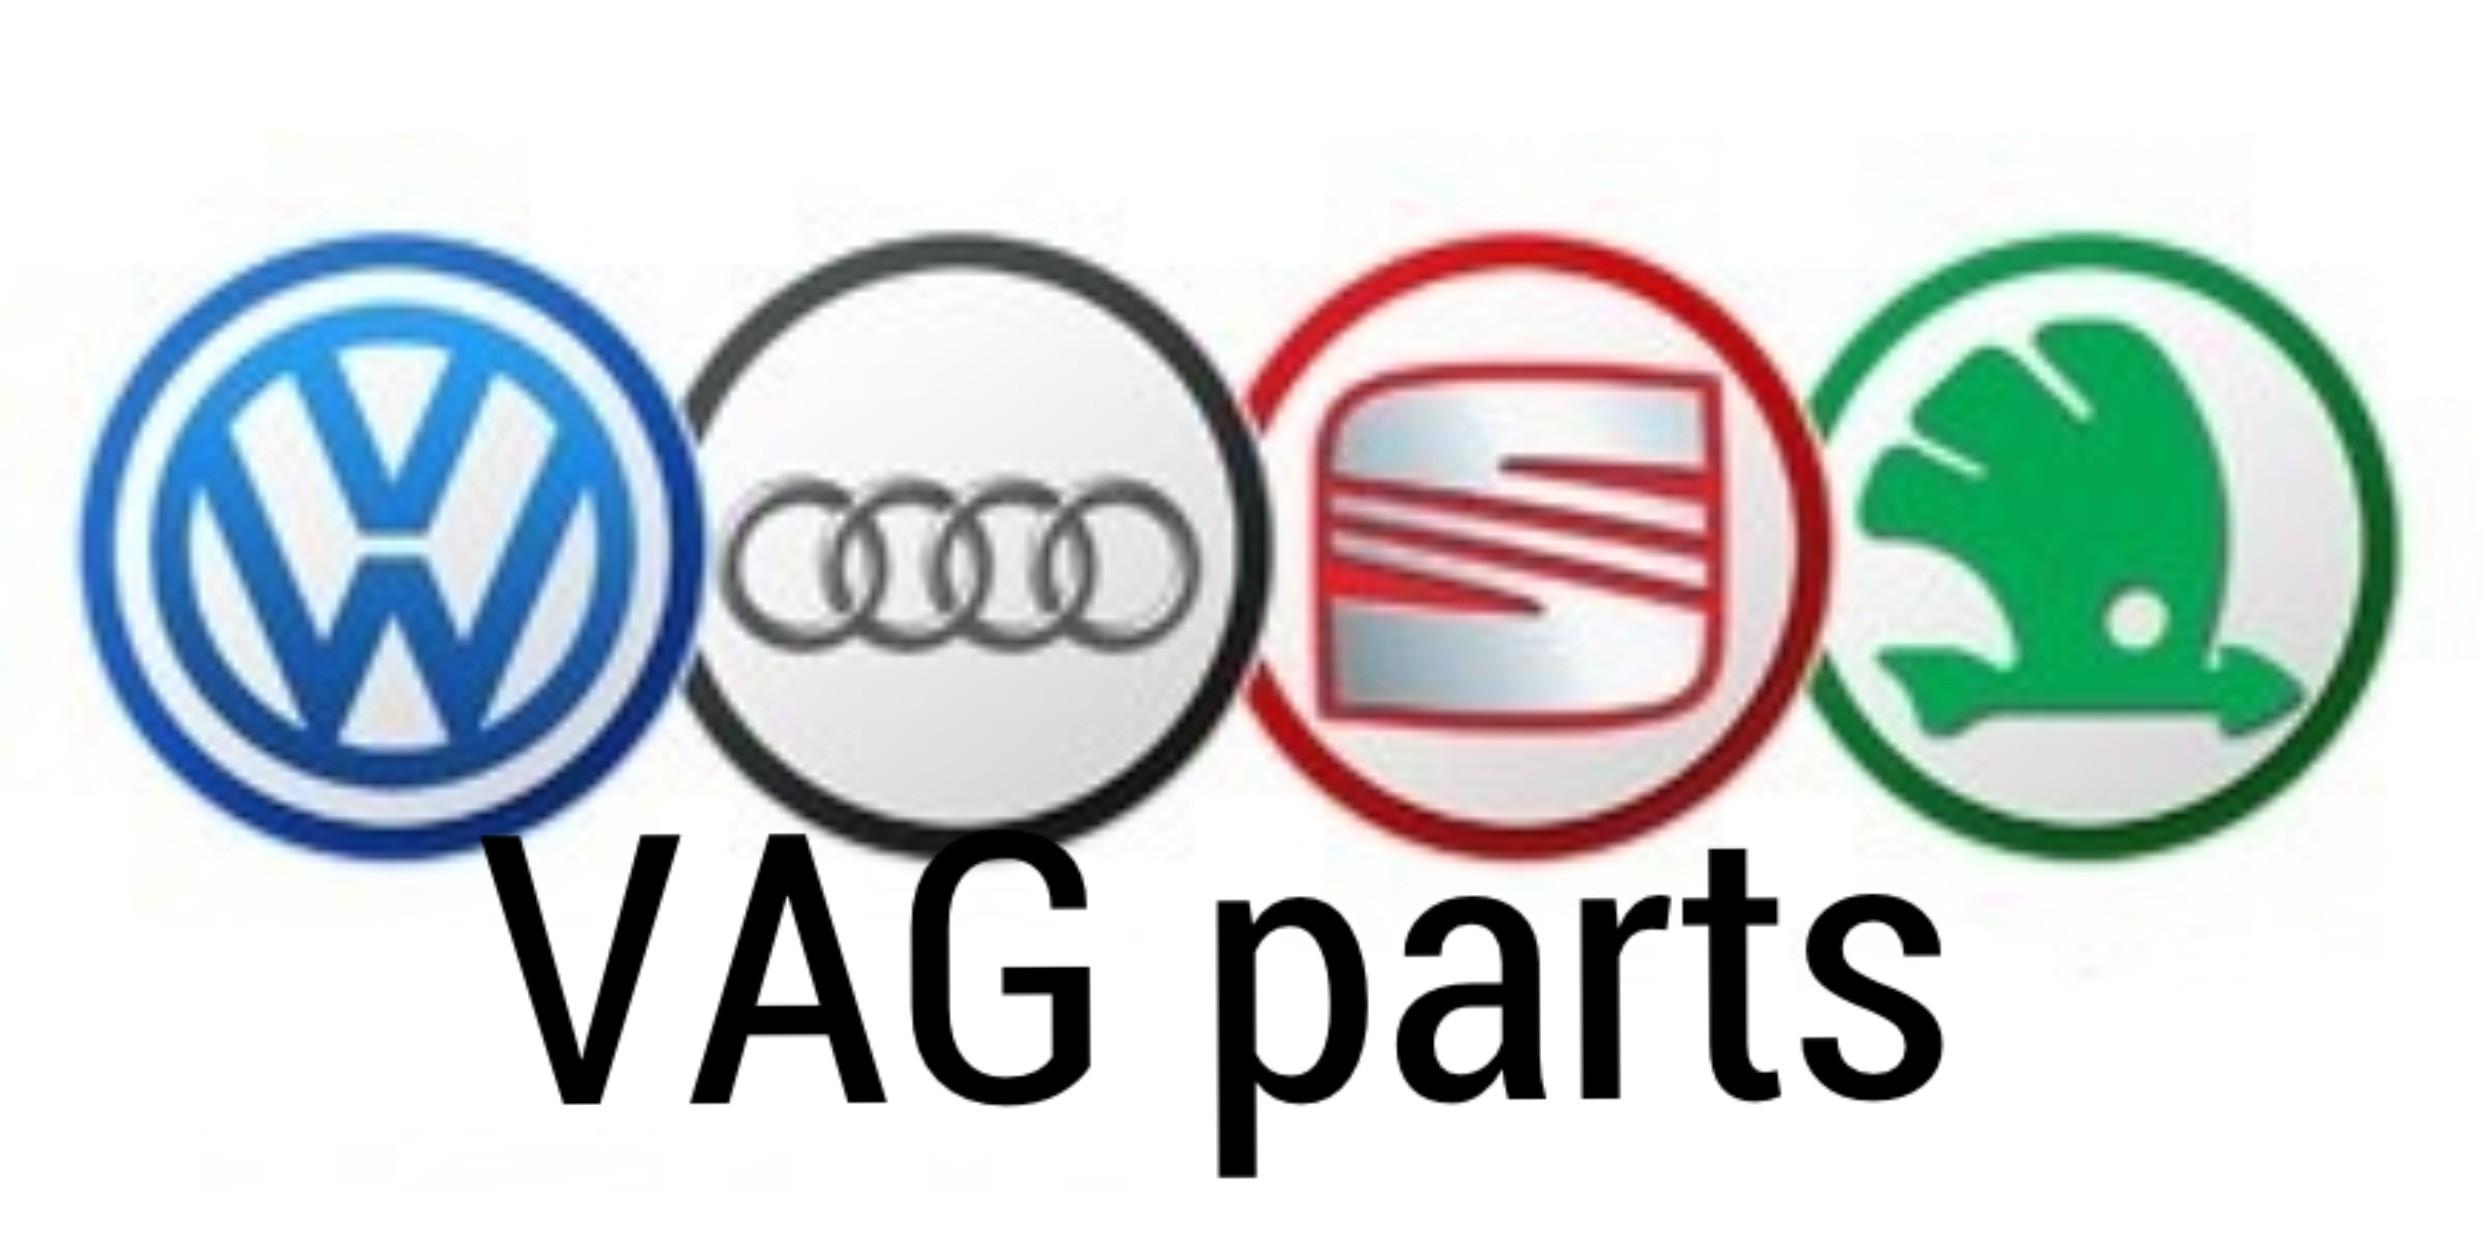 VAG parts